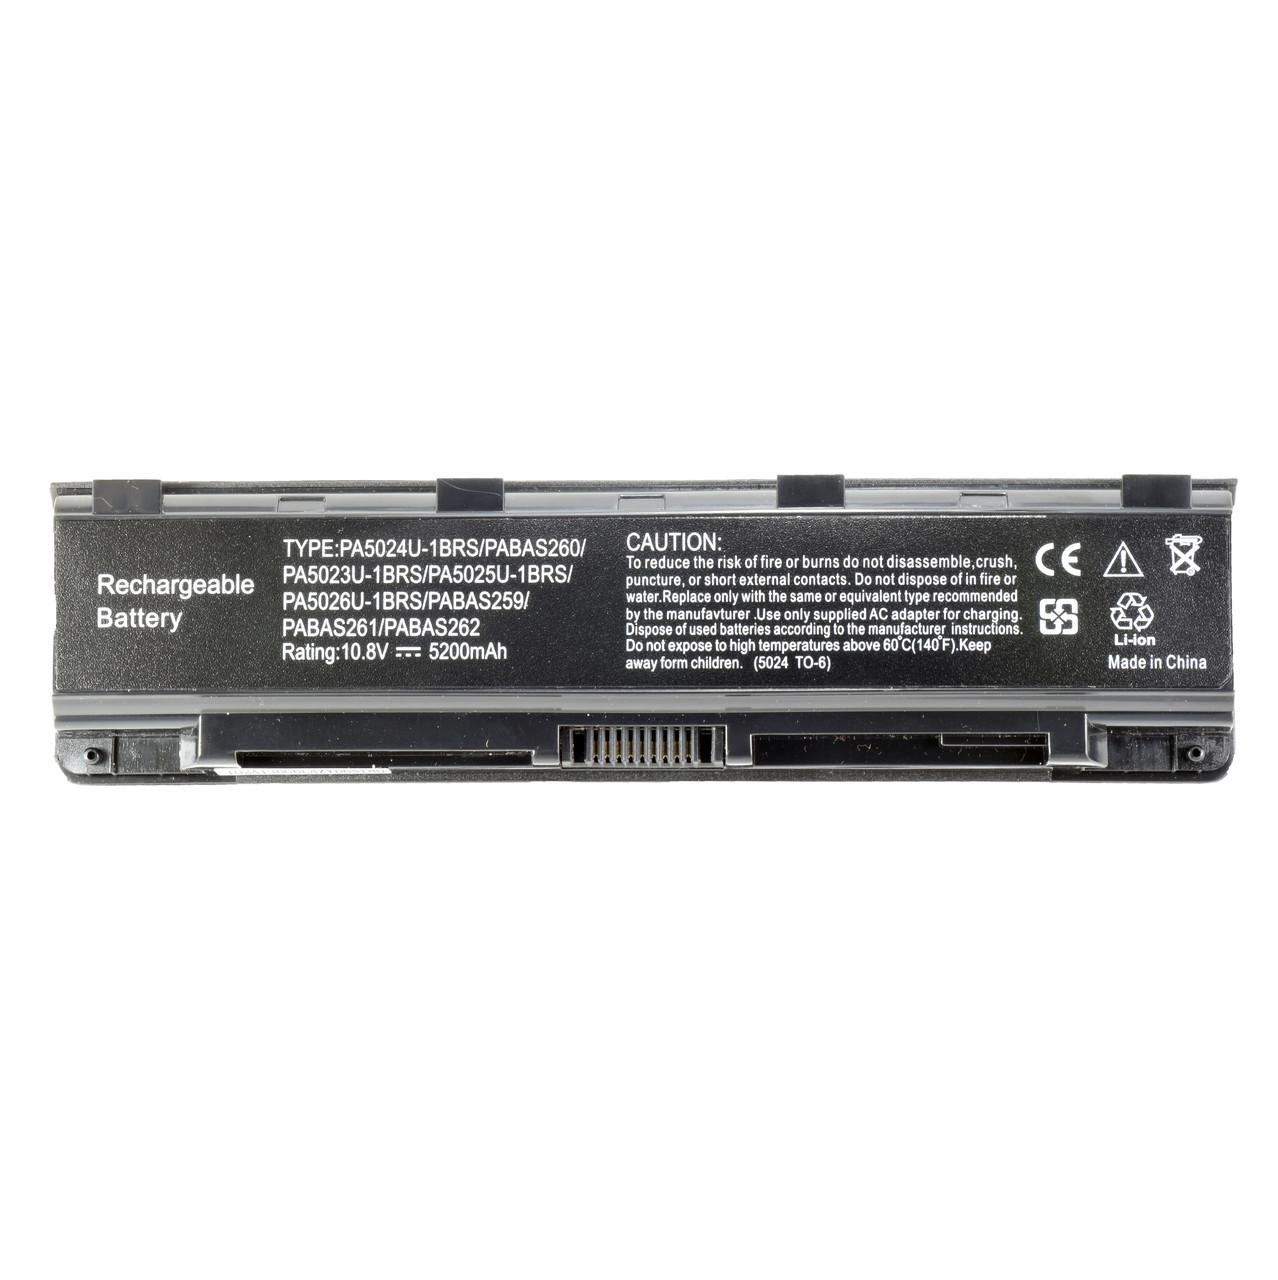 Батарея для ноутбука TOSHIBA Dynabook Qosmio T752 T772 Satellite M800 P875D S800 S875